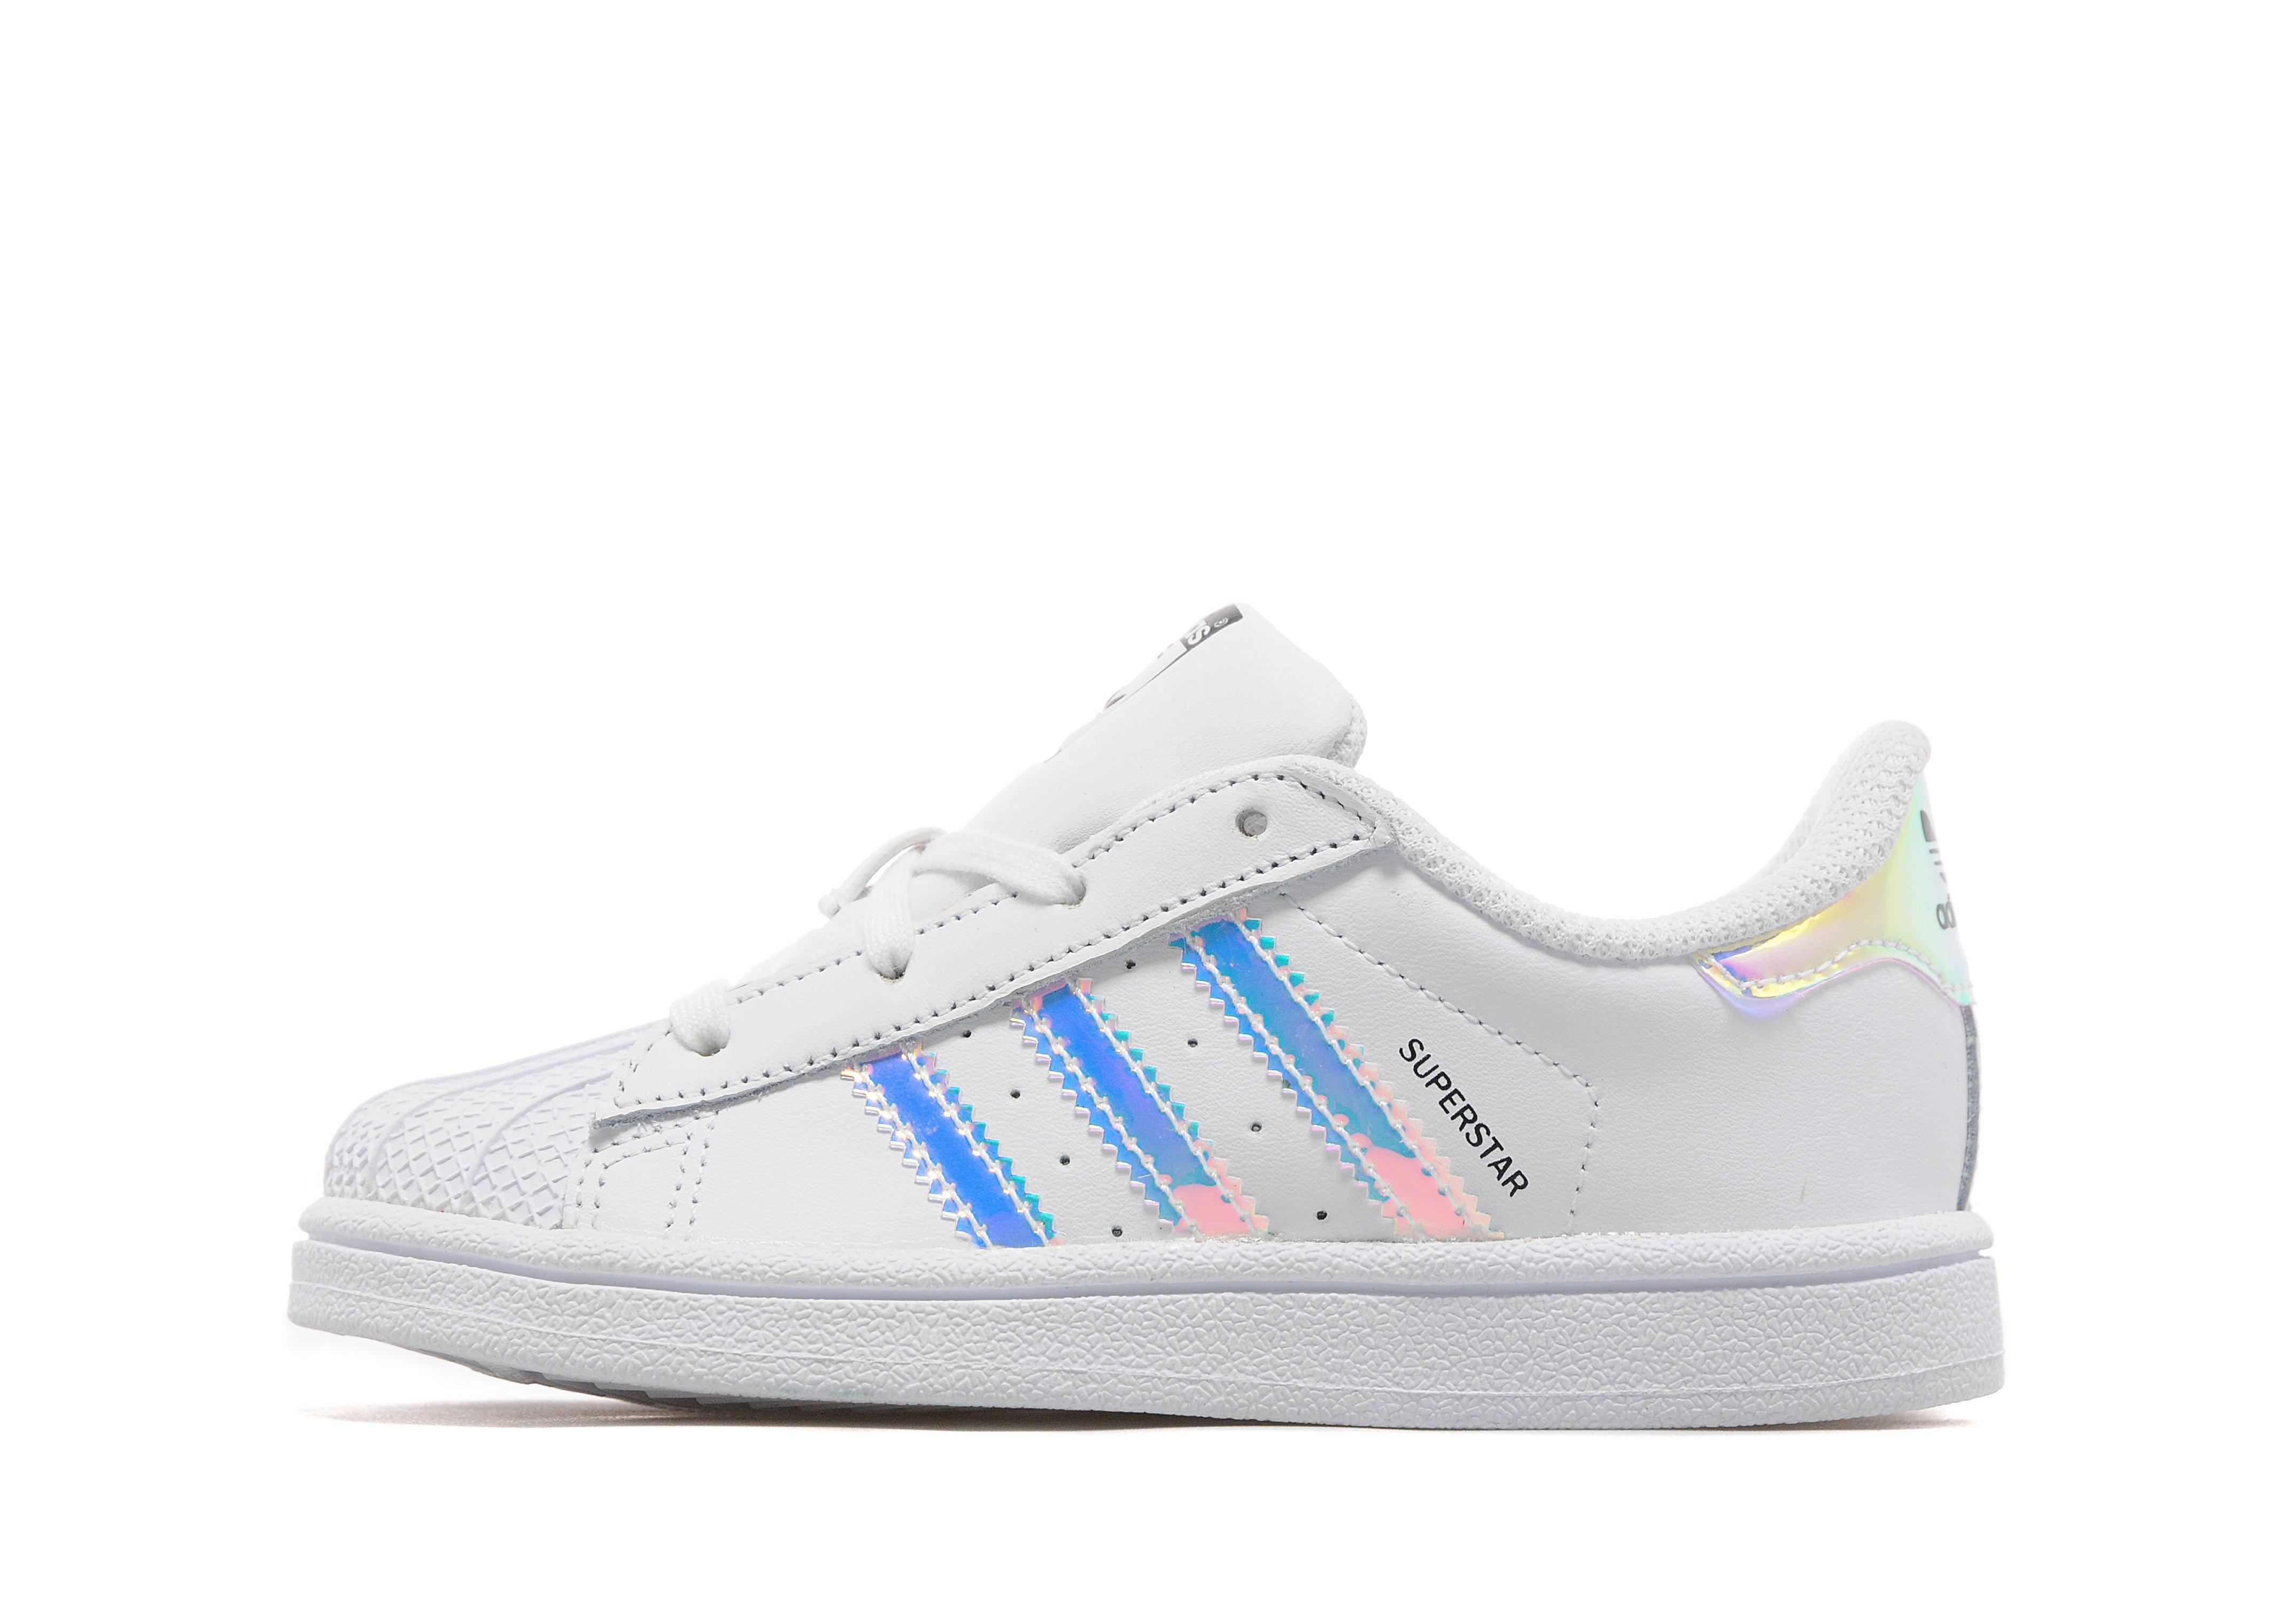 Xpuikz Avis Superstar Adidas En Taille Ligne XPiuOkZ